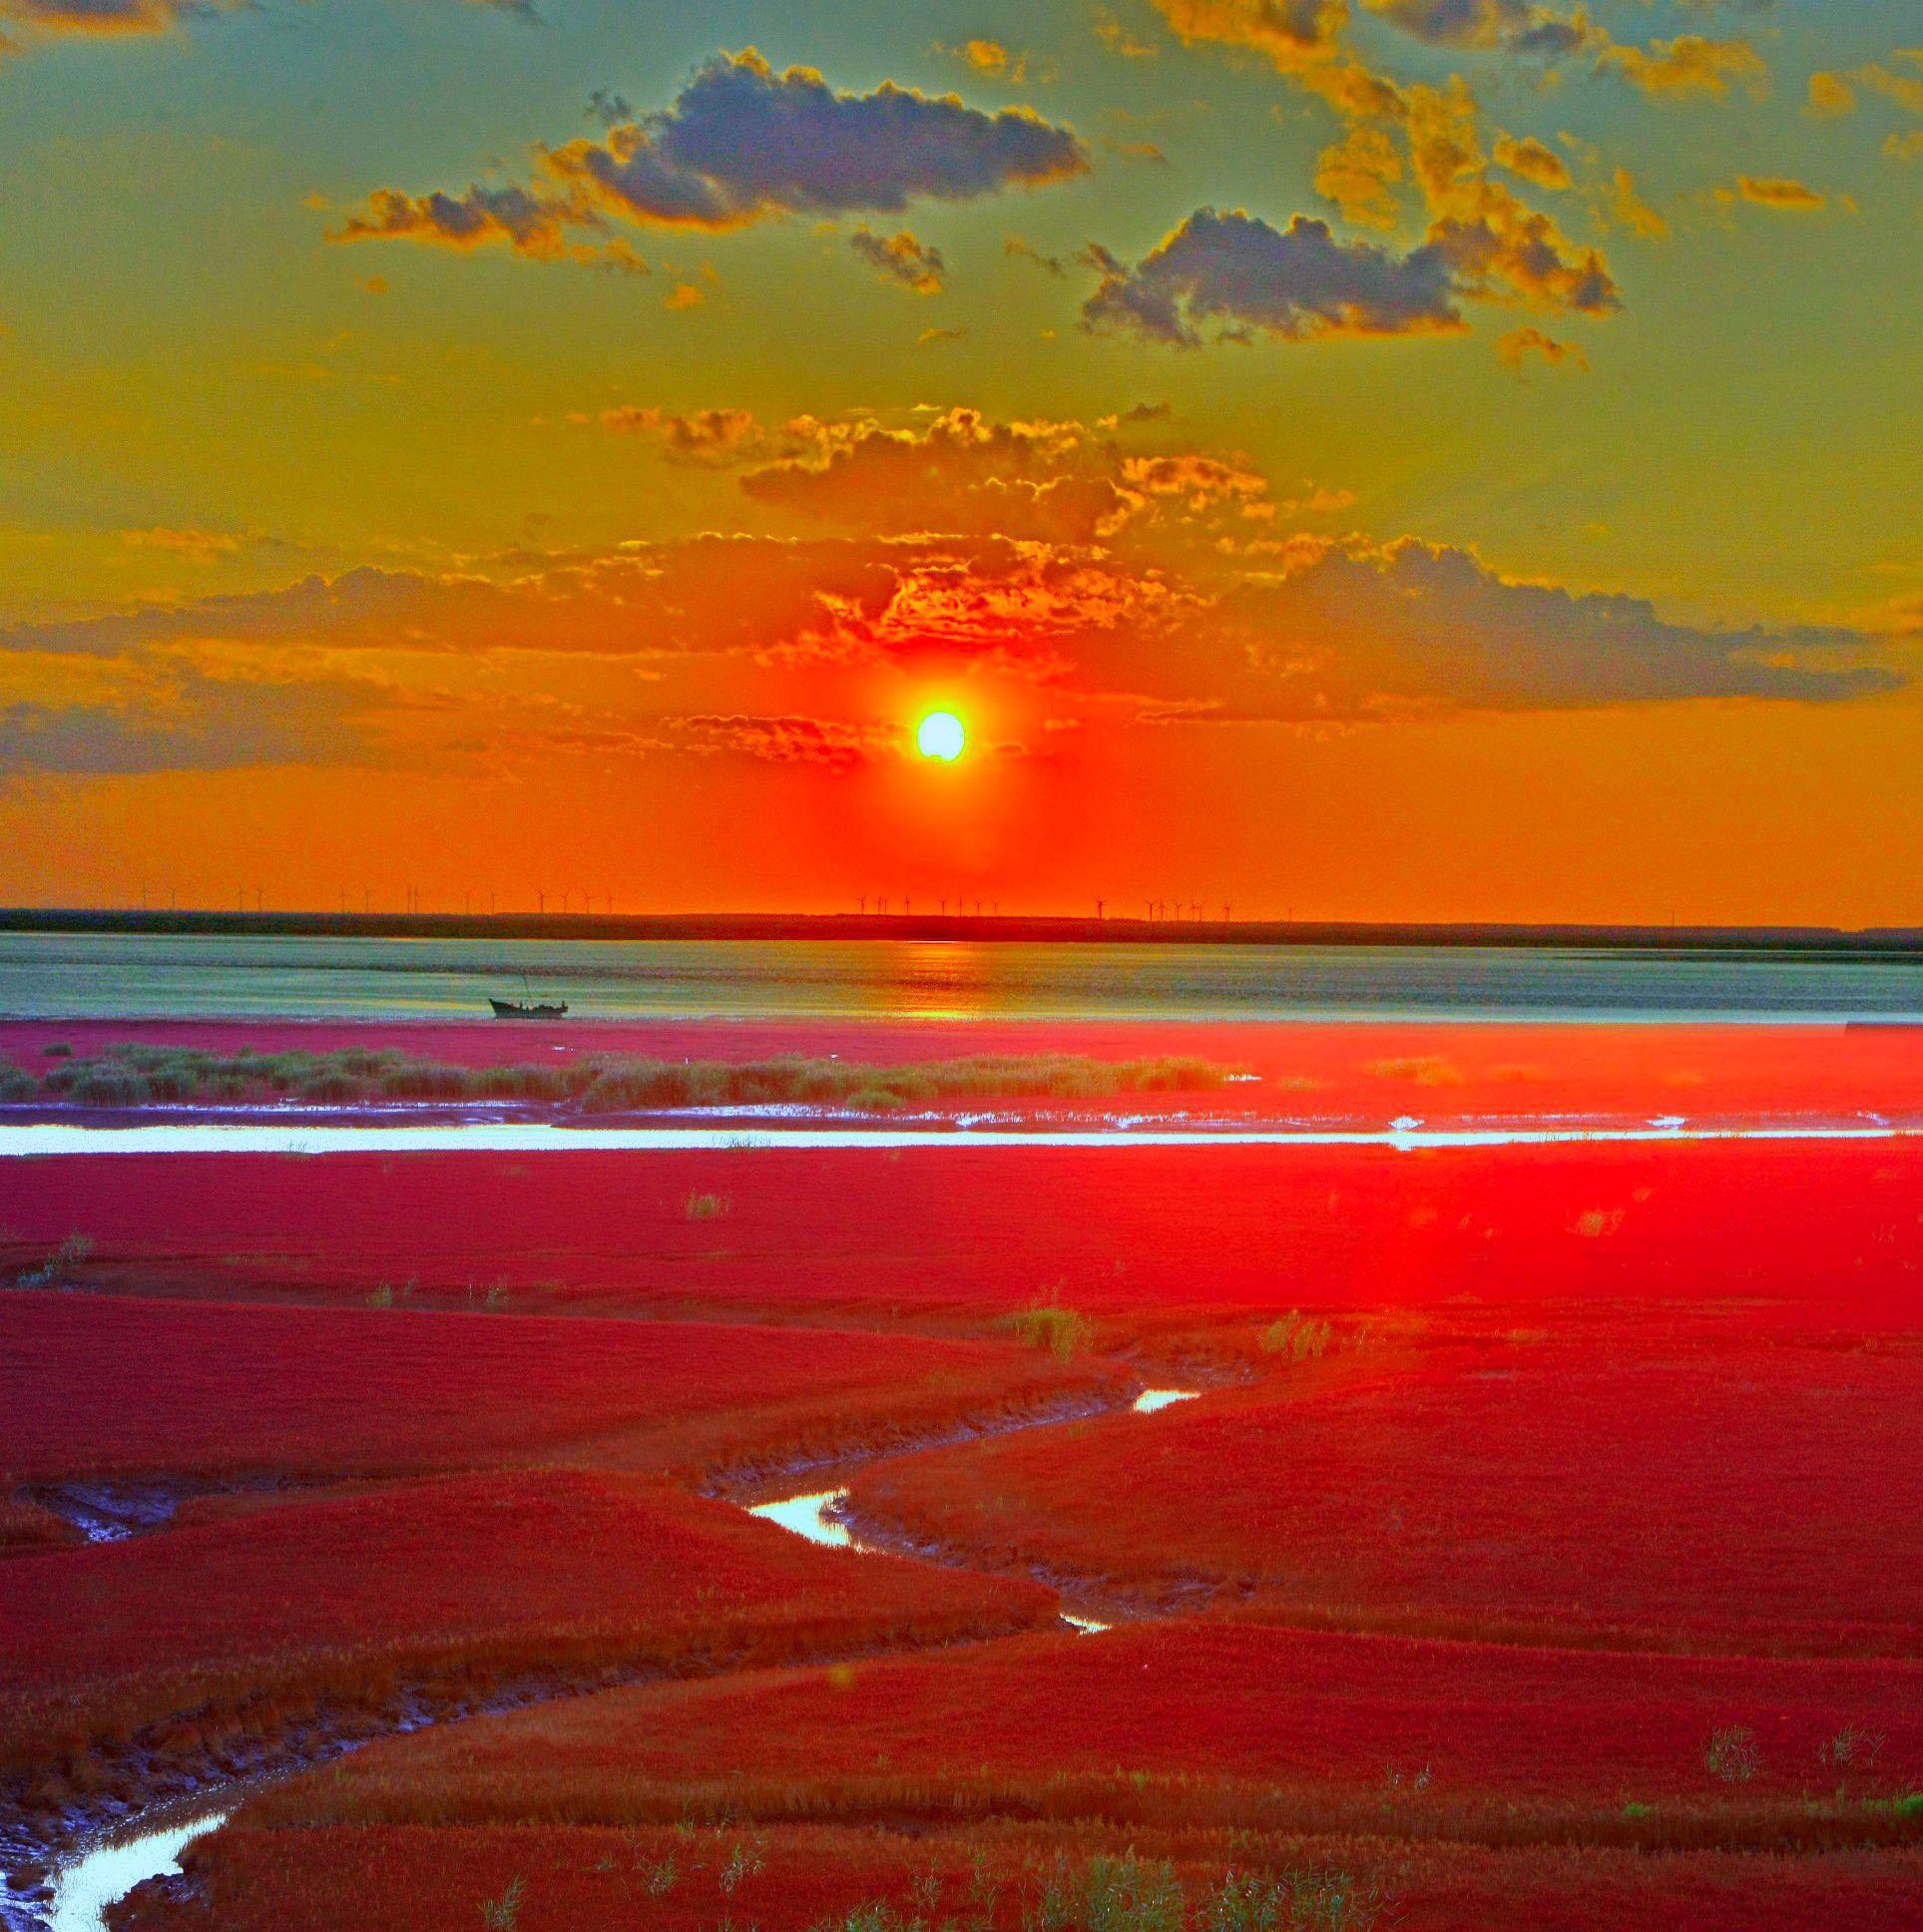 Extraordinary flaming landscape of China's Red Seabeach seashore